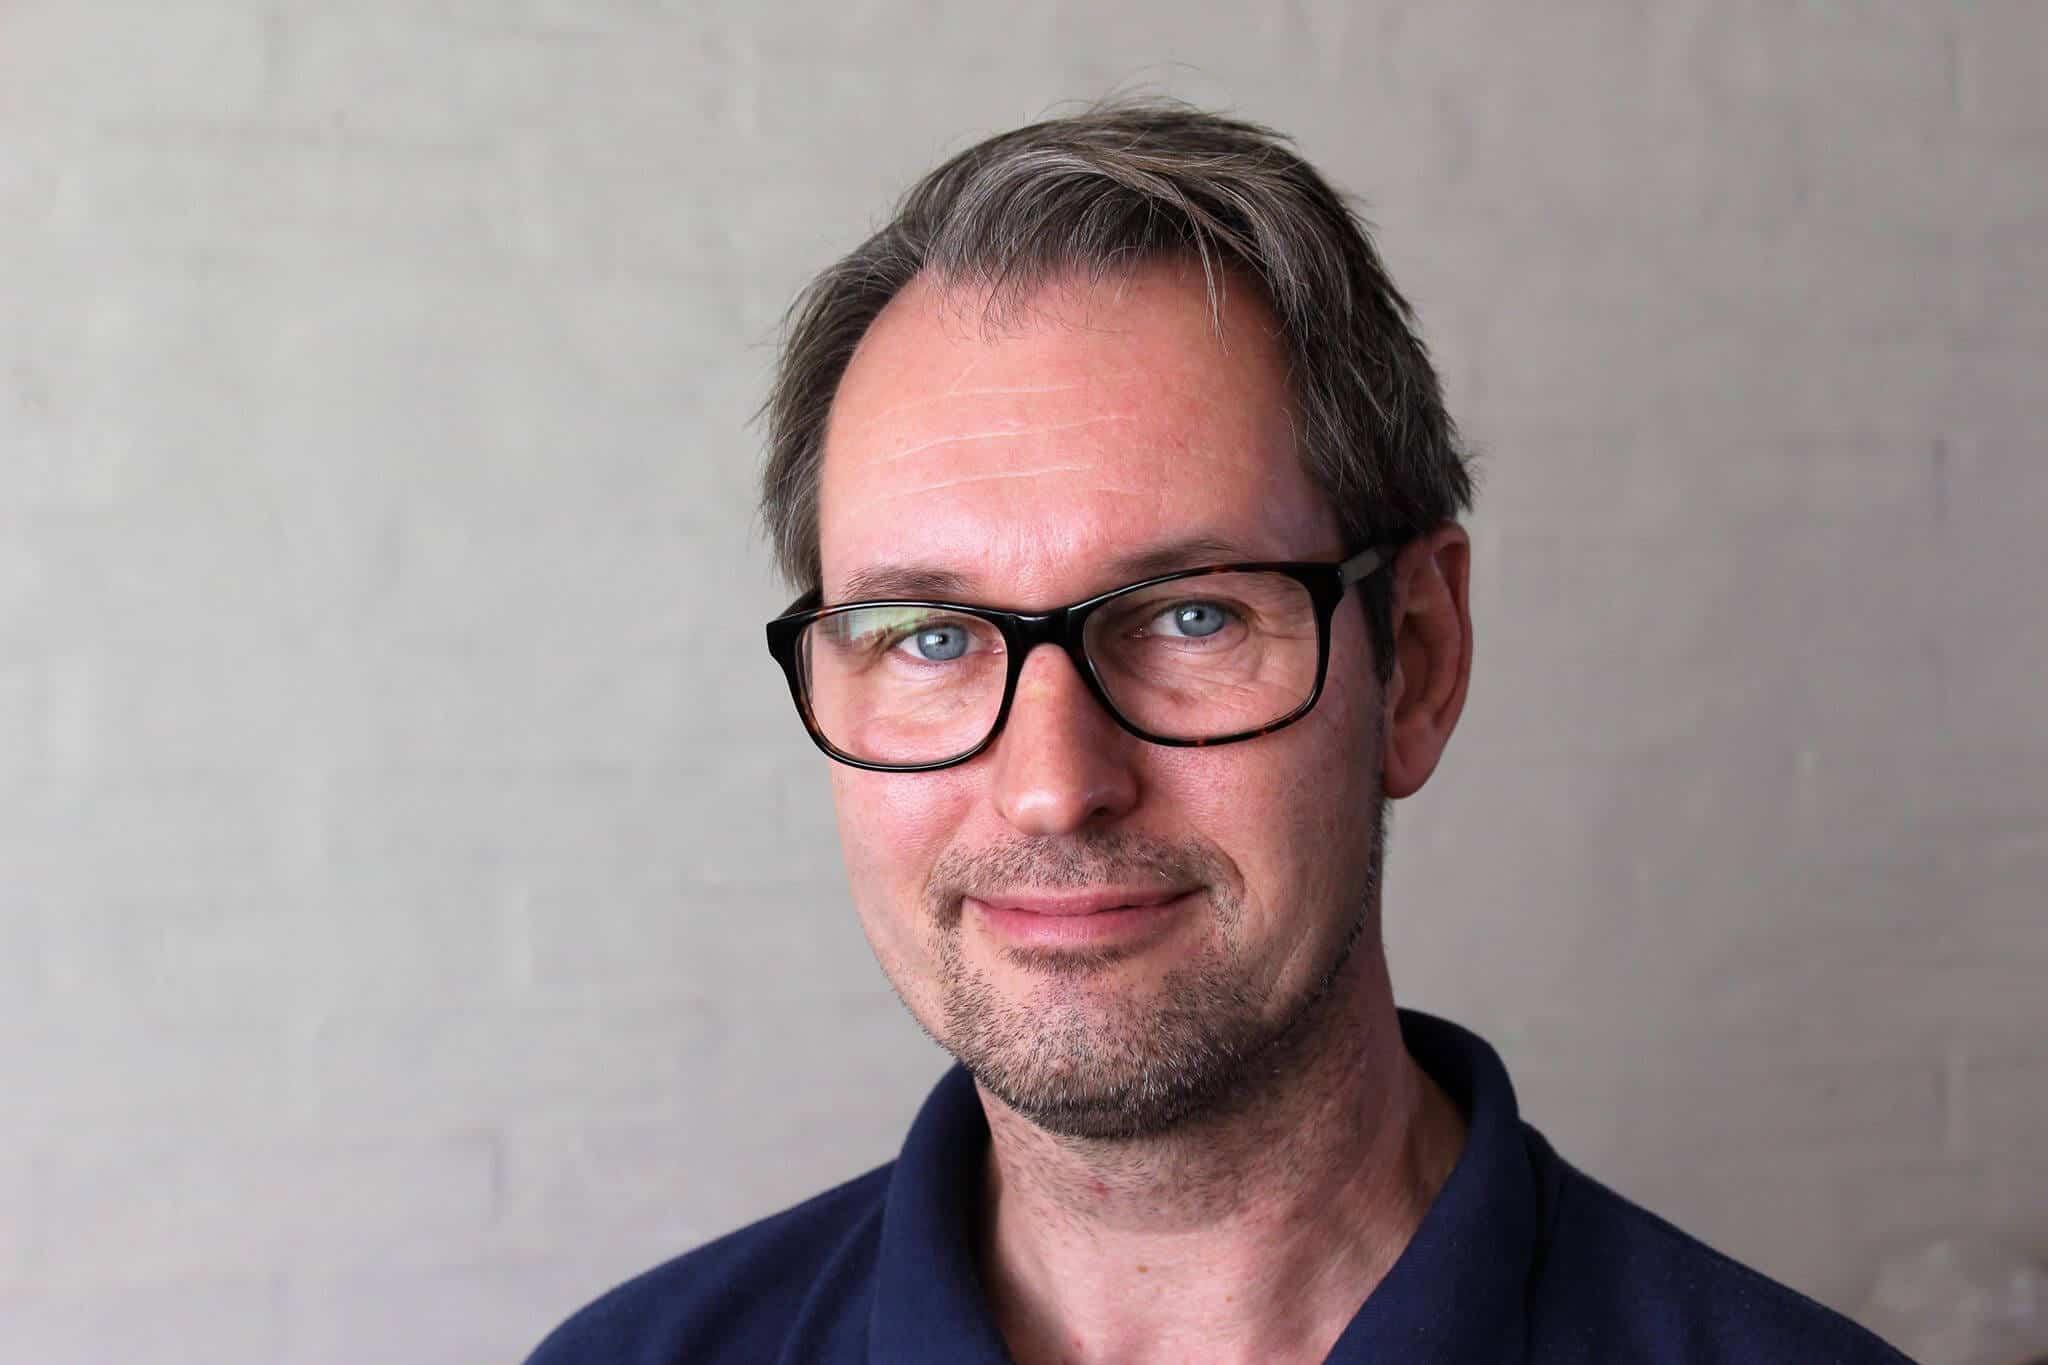 Clairvoyant & Healer Thomas Kofoed Ejsing